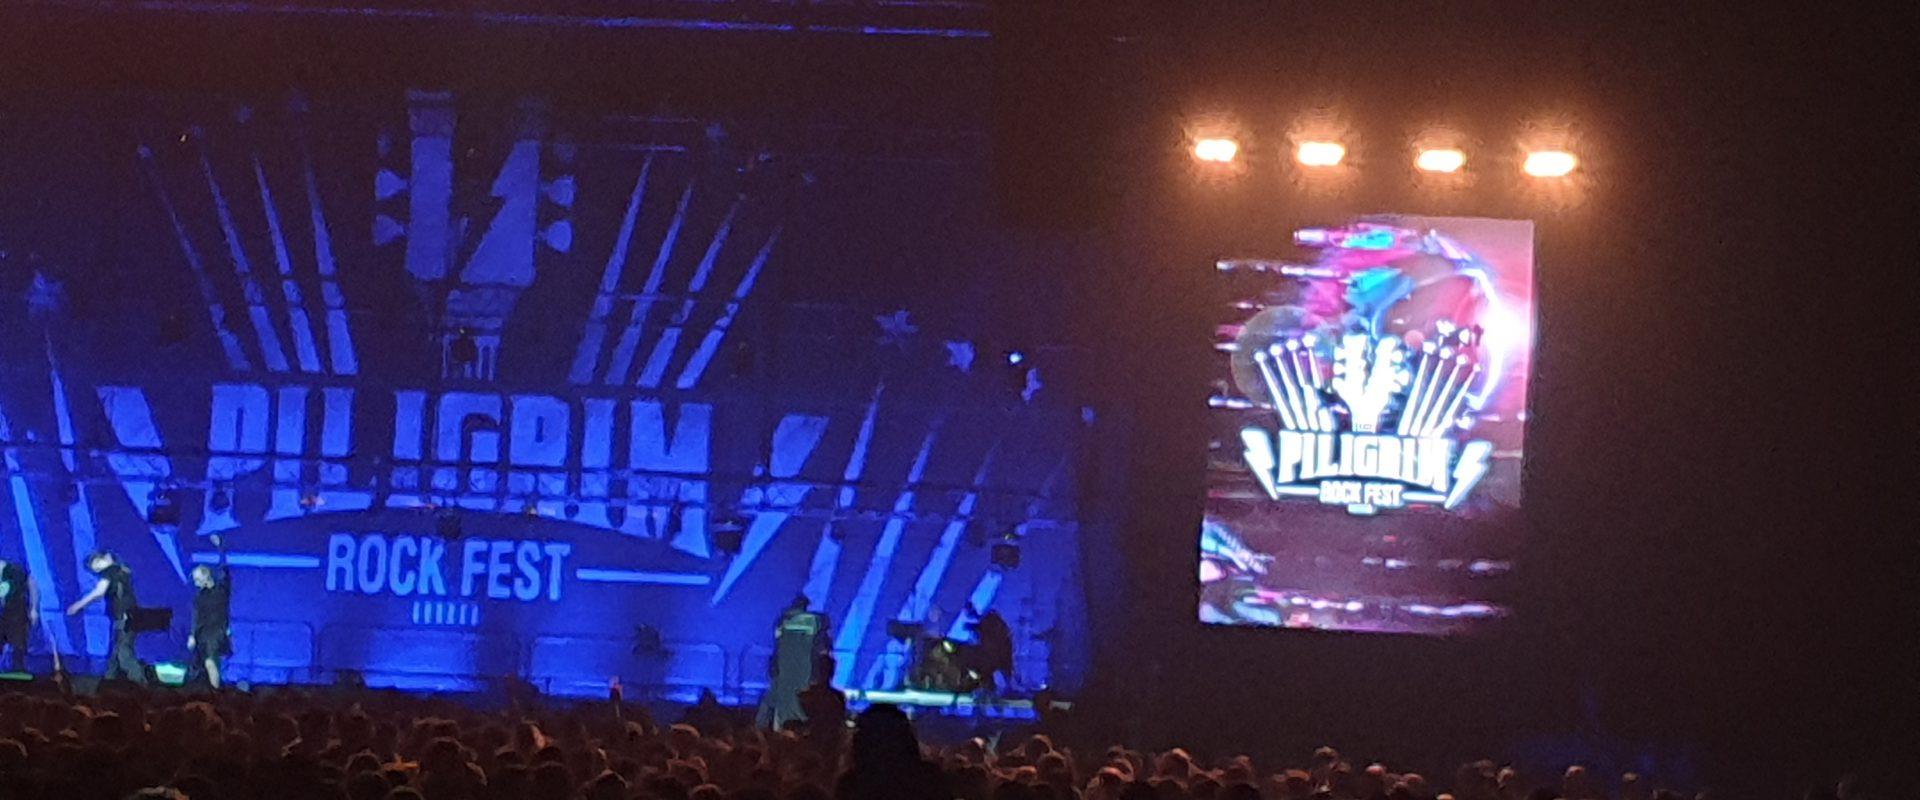 PILIGRIM Rock Festival am 04. Mai 2019, 17:00 Uhr – SAP Arena Mannheim